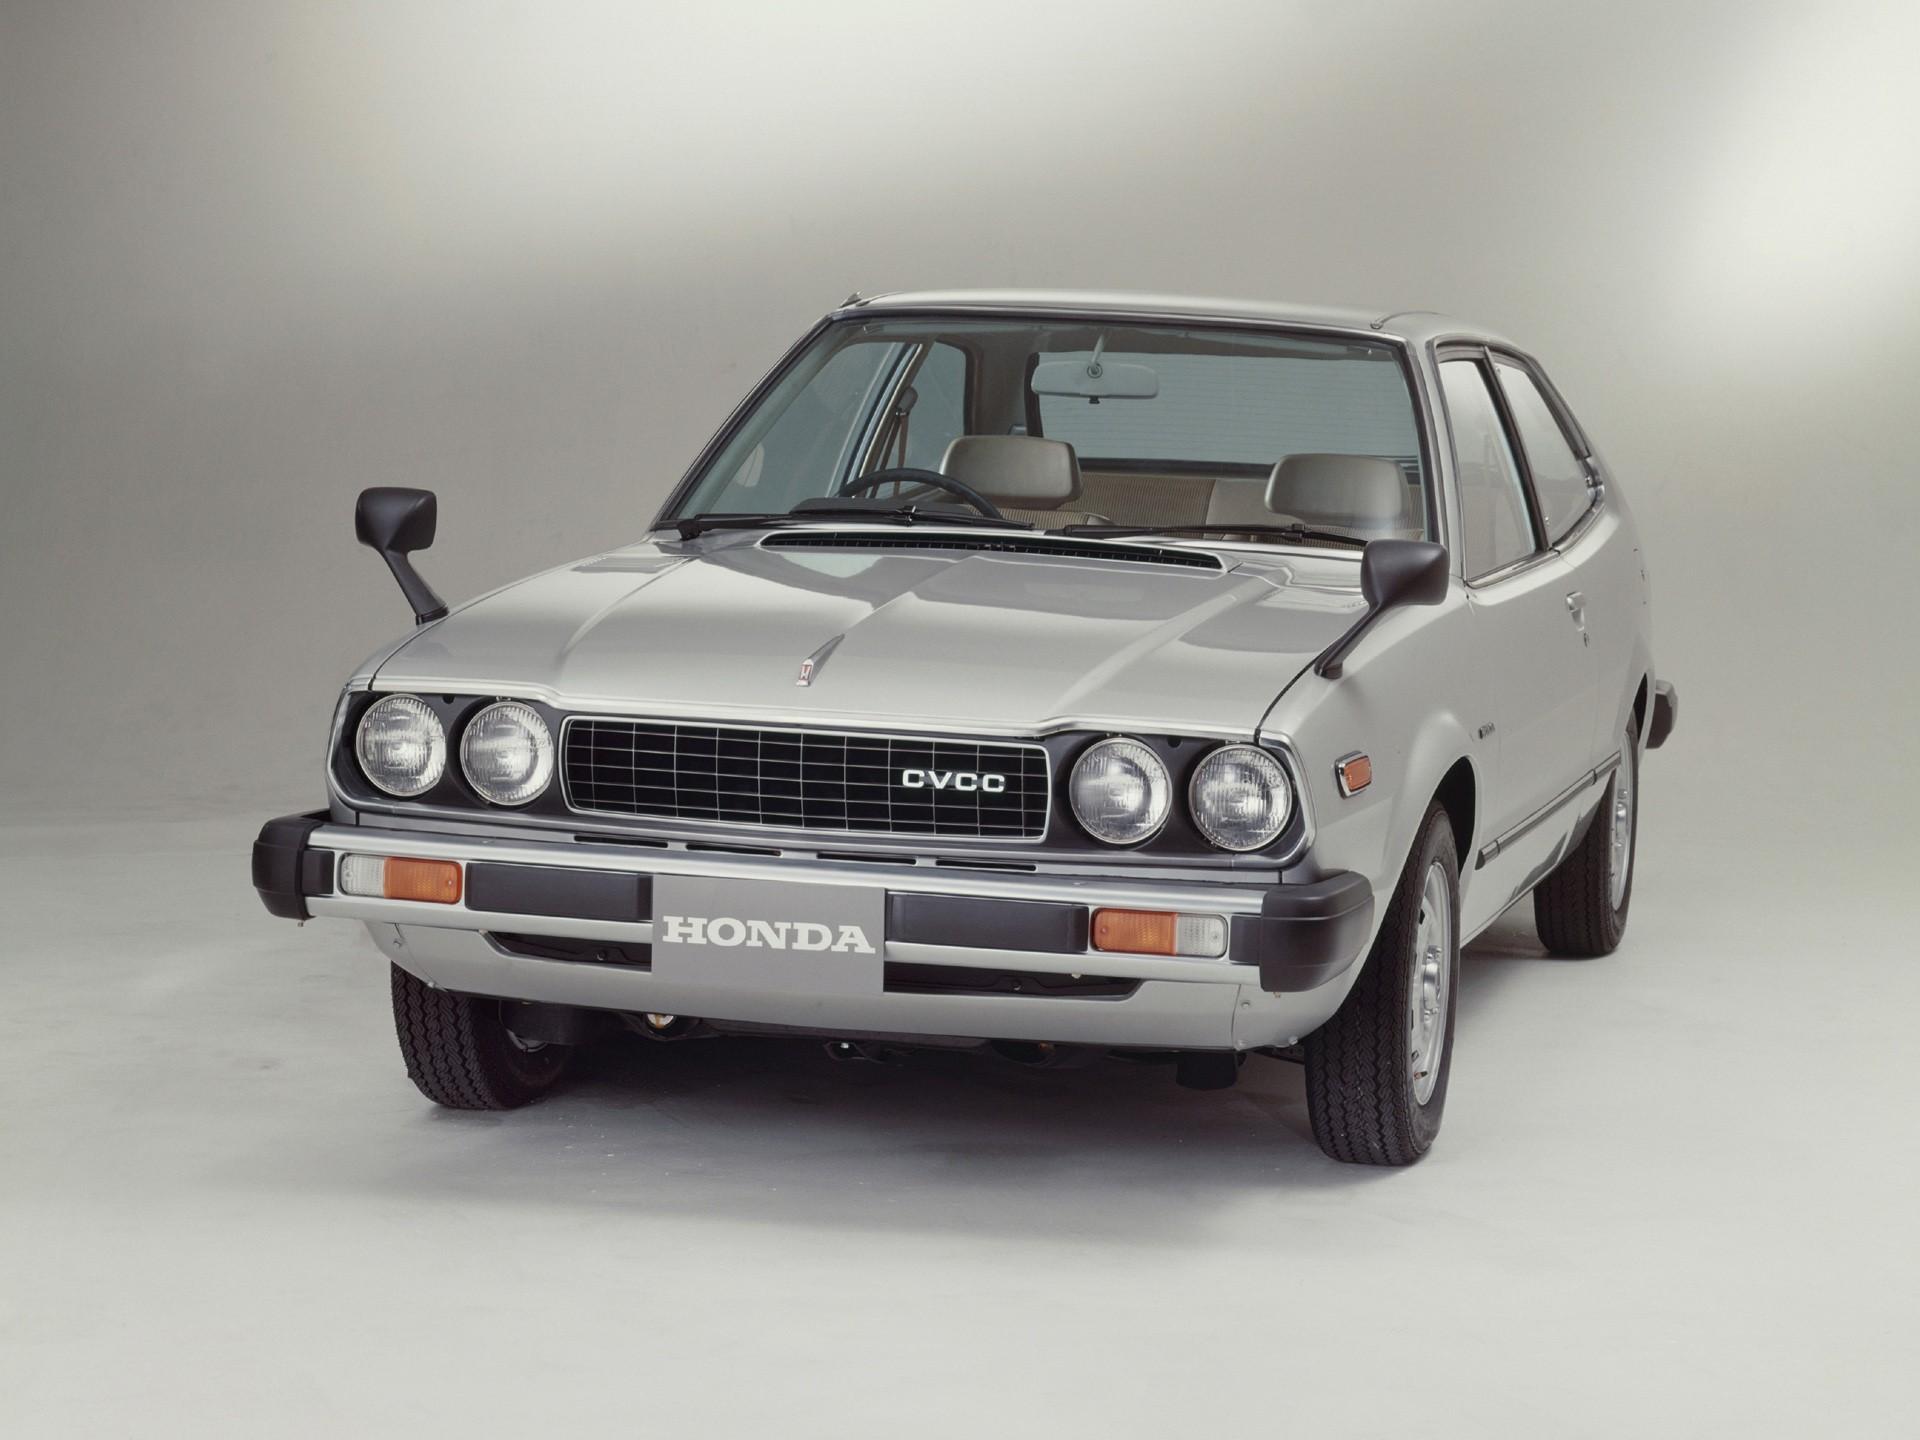 Honda Accord I 1976 - 1981 Hatchback 3 door #2